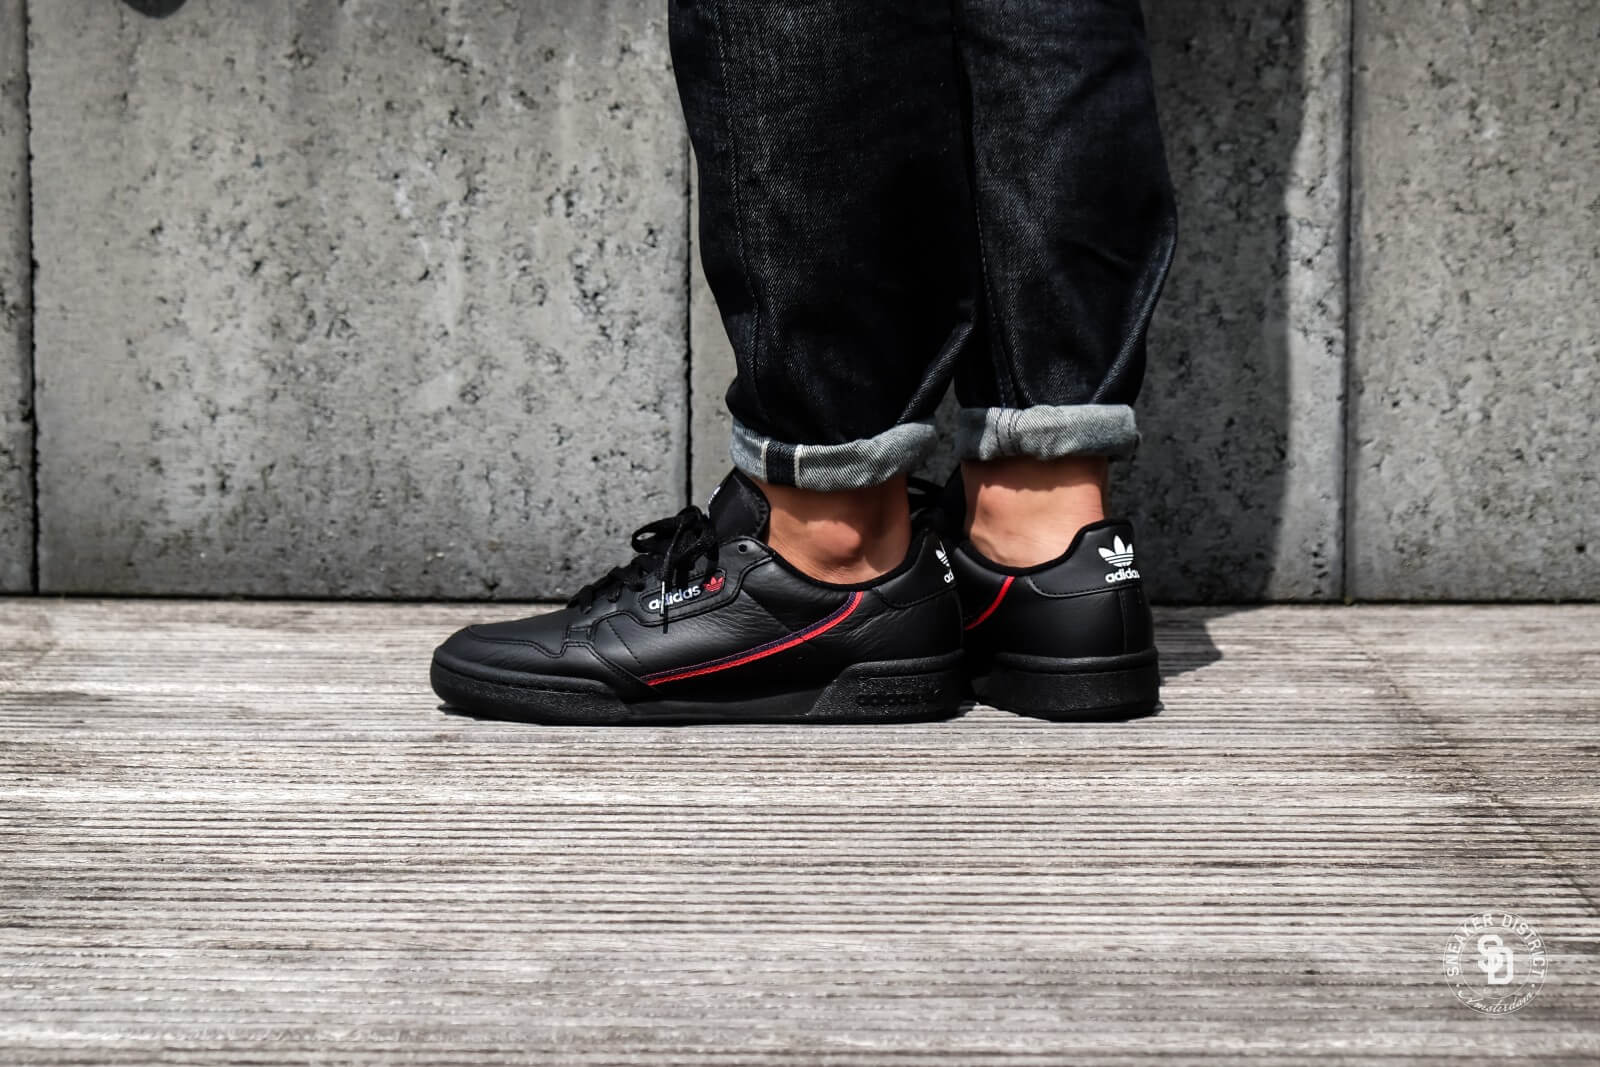 Adidas Continental 80 Core BlackScarletNavy B41672